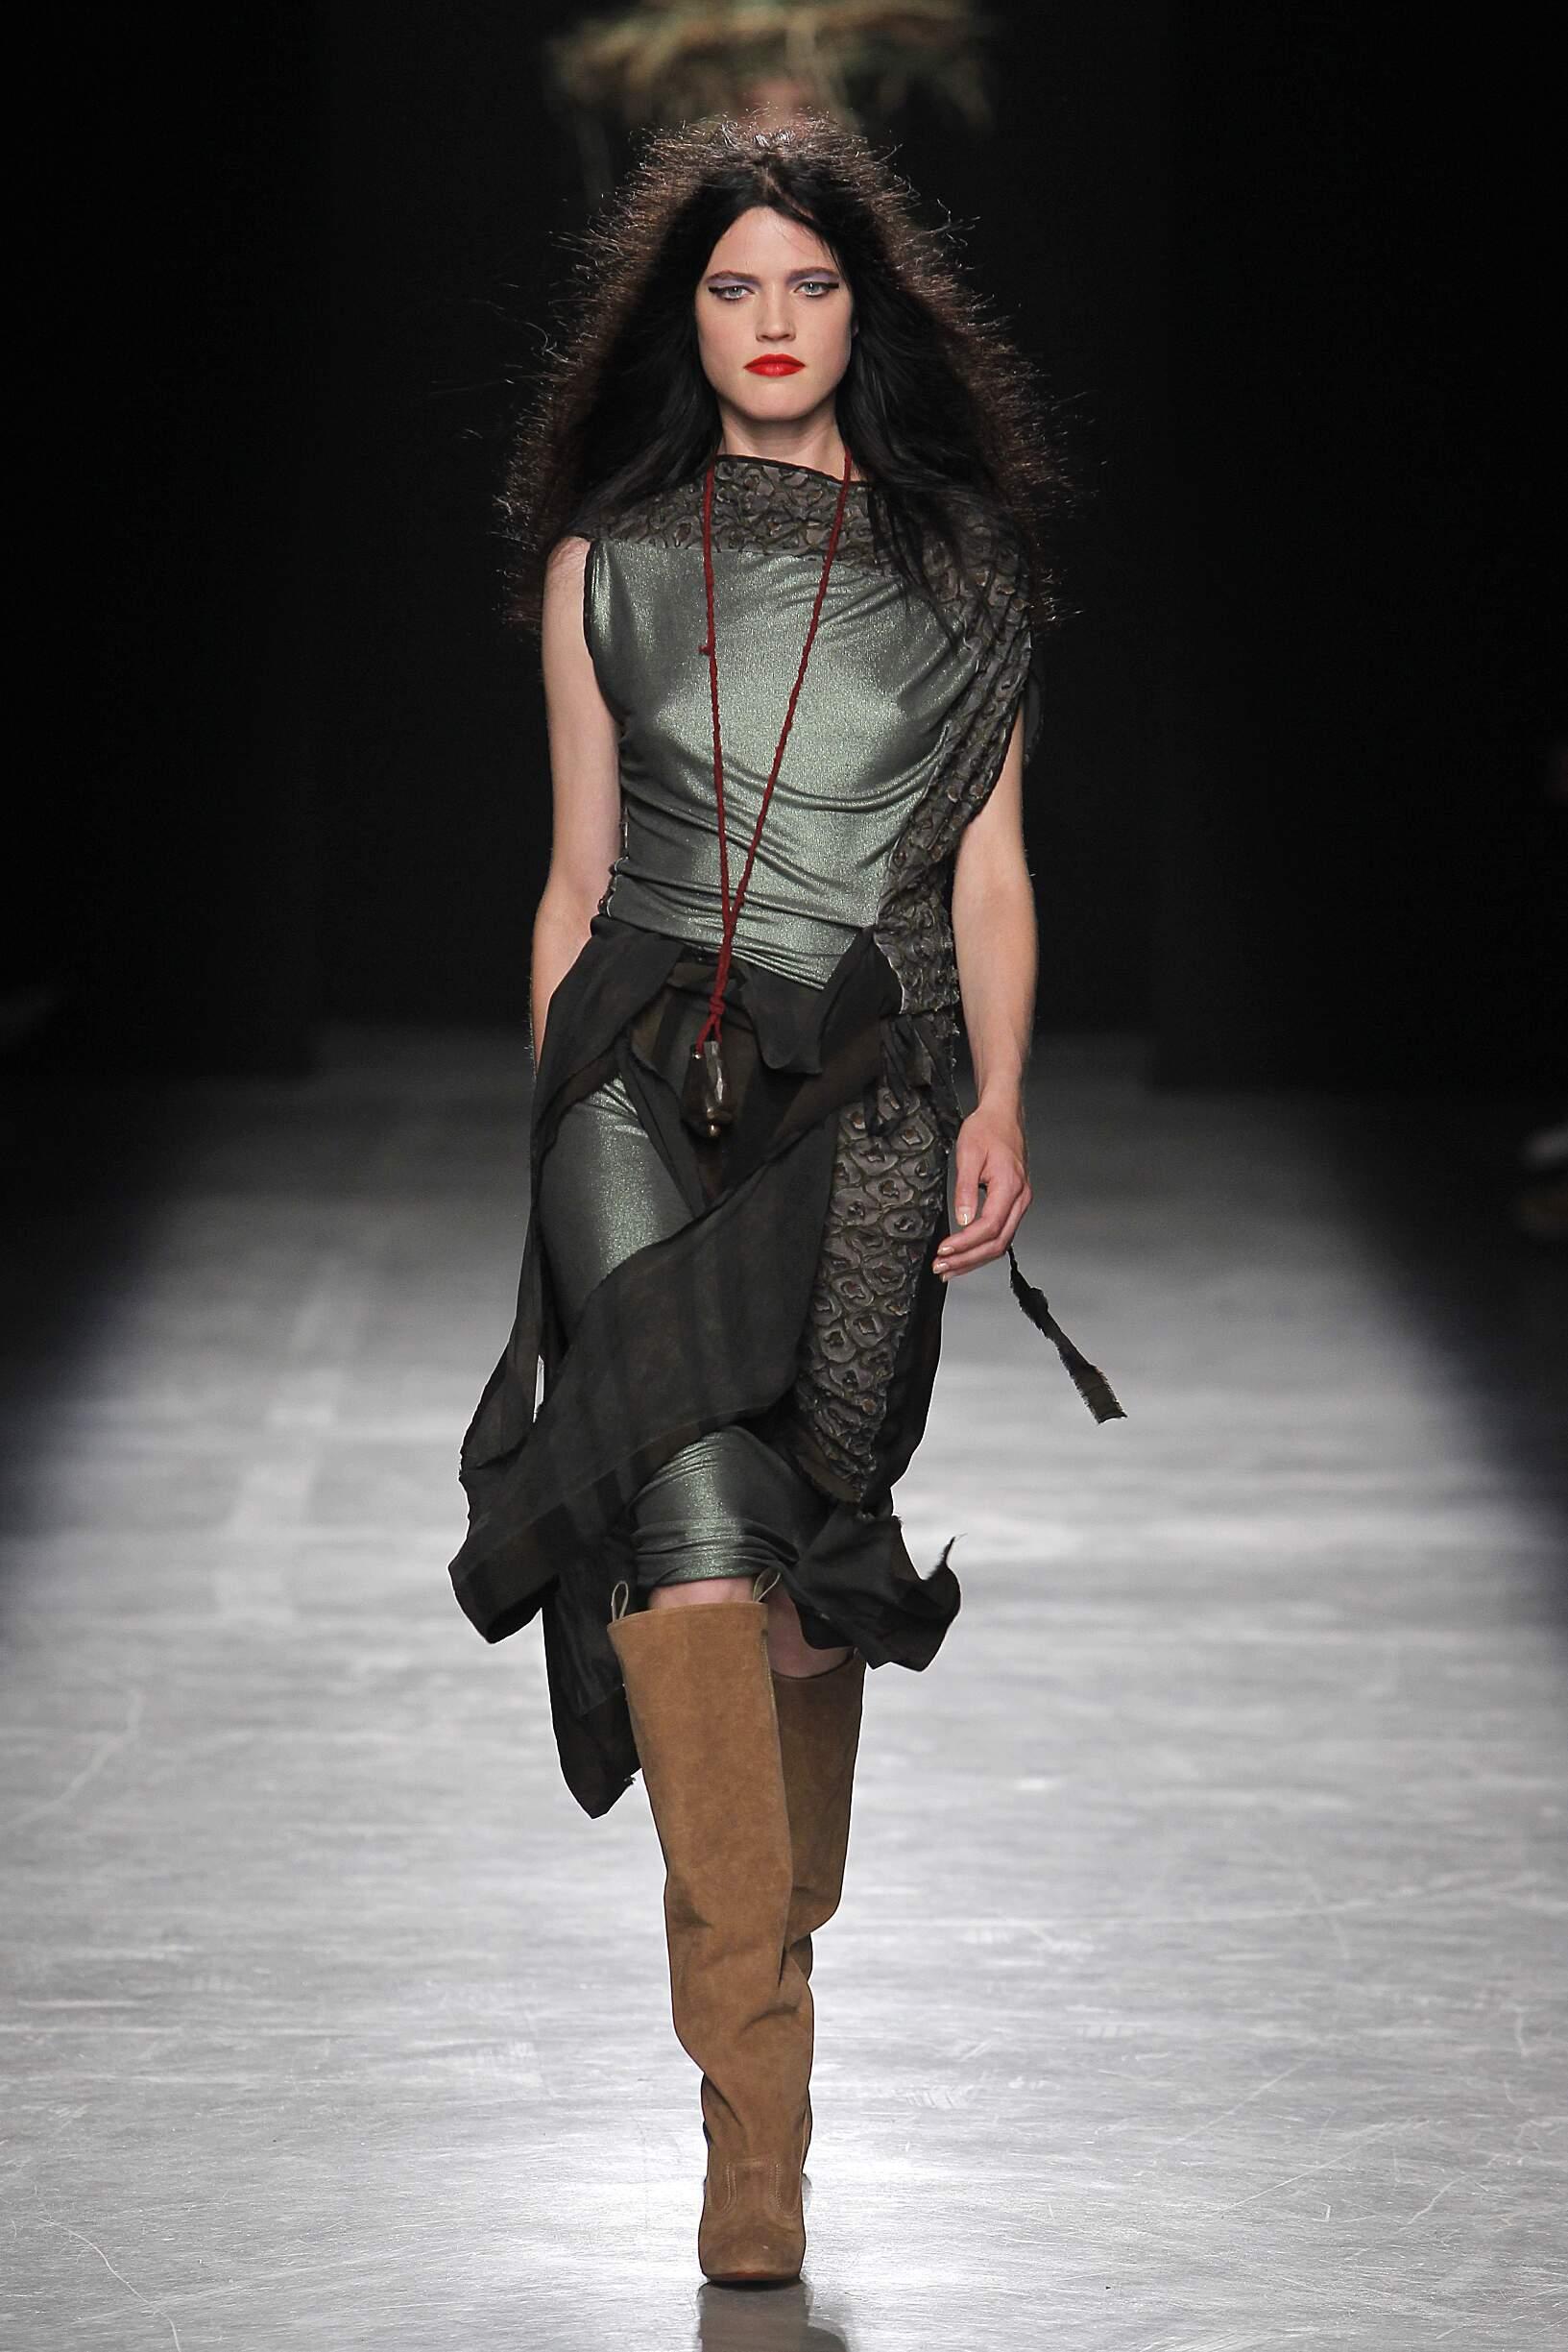 Fashion Woman Model Andreas Kronthaler for Vivienne Westwood Catwalk